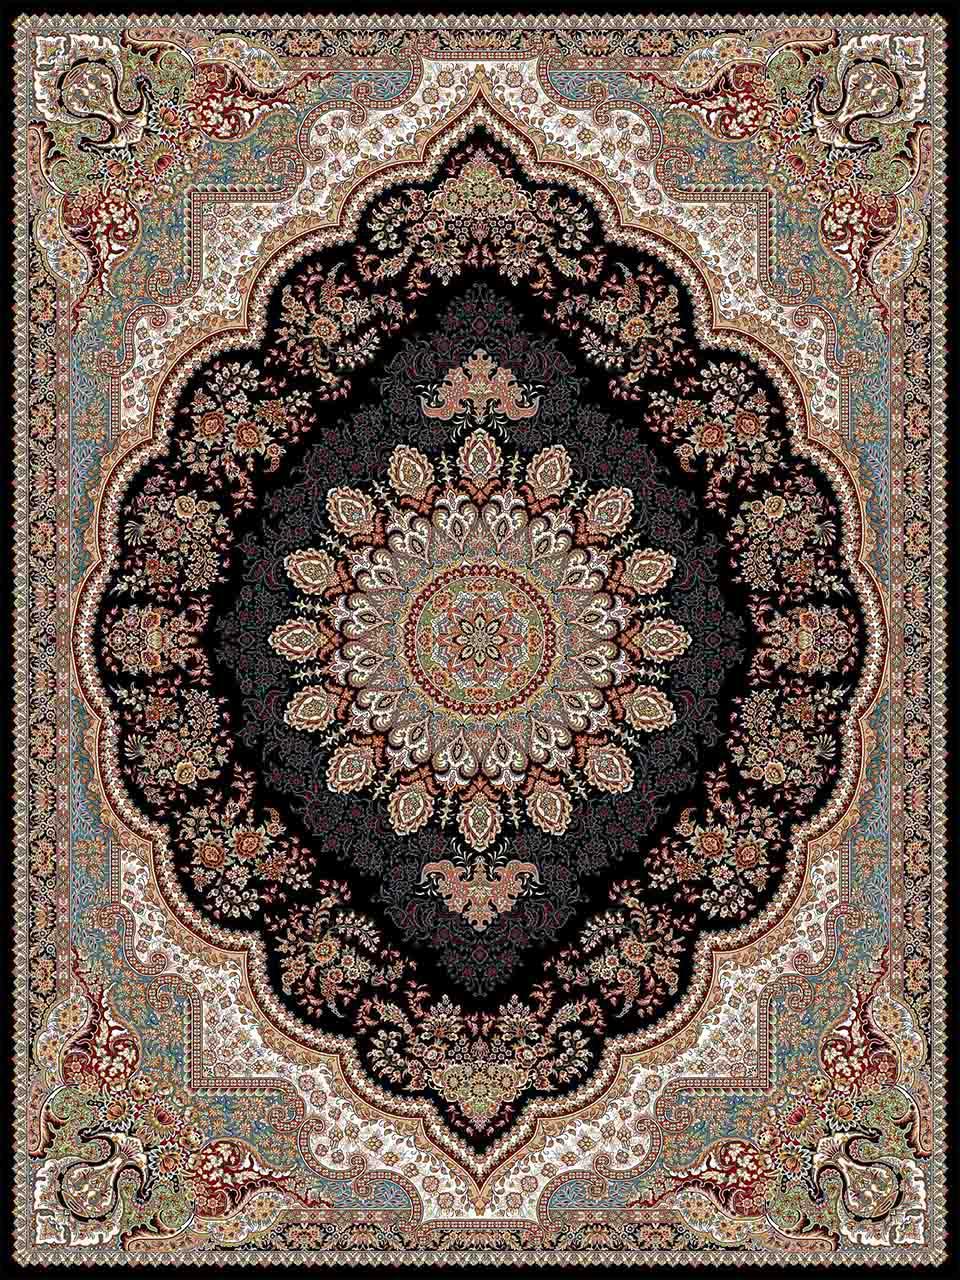 فرش (25012) اکریلیک - 8 رنگ - 700 شانه - سورمه اي - تراکم 2550